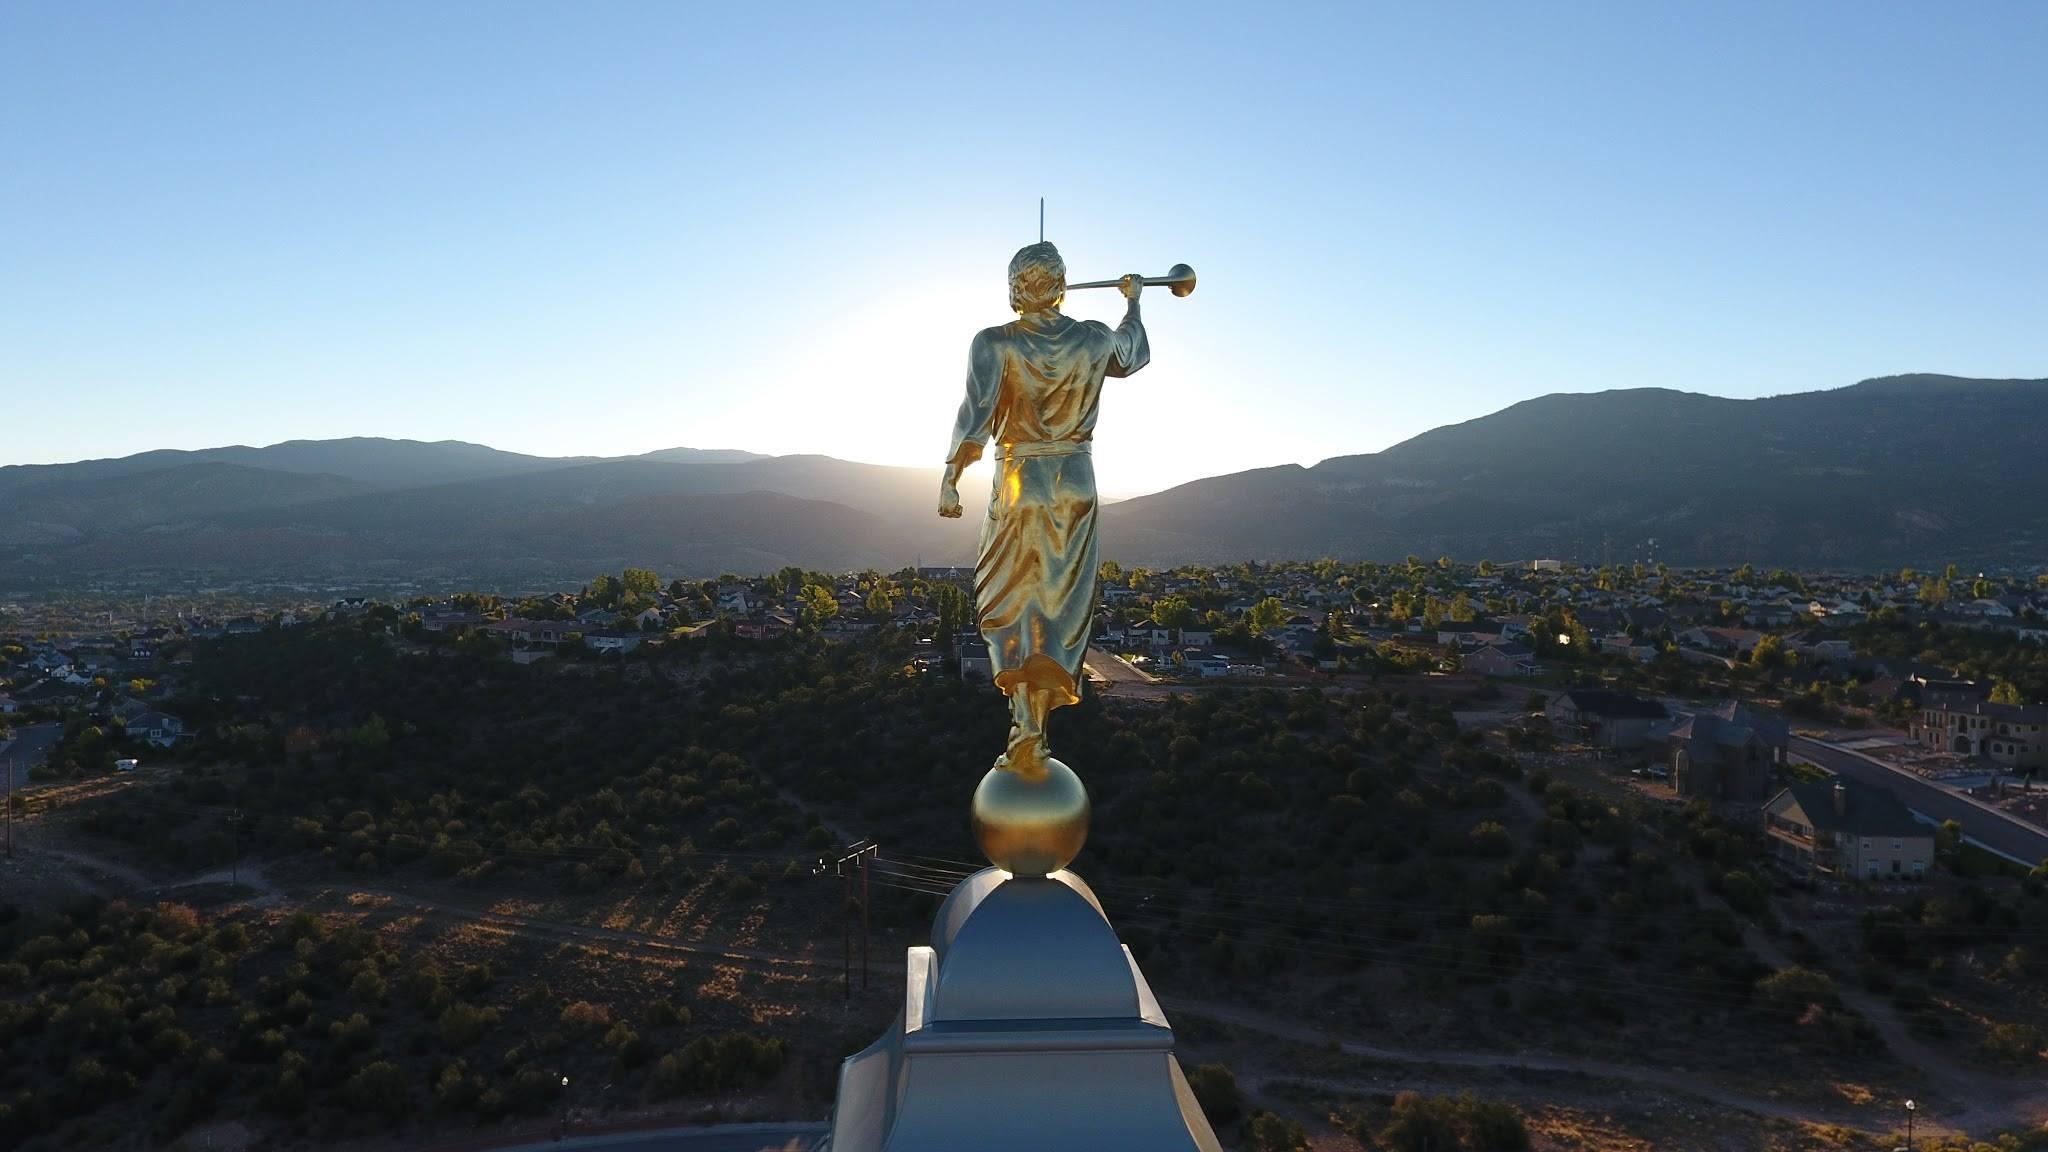 angel moroni on the cedar city temple during the sunrise